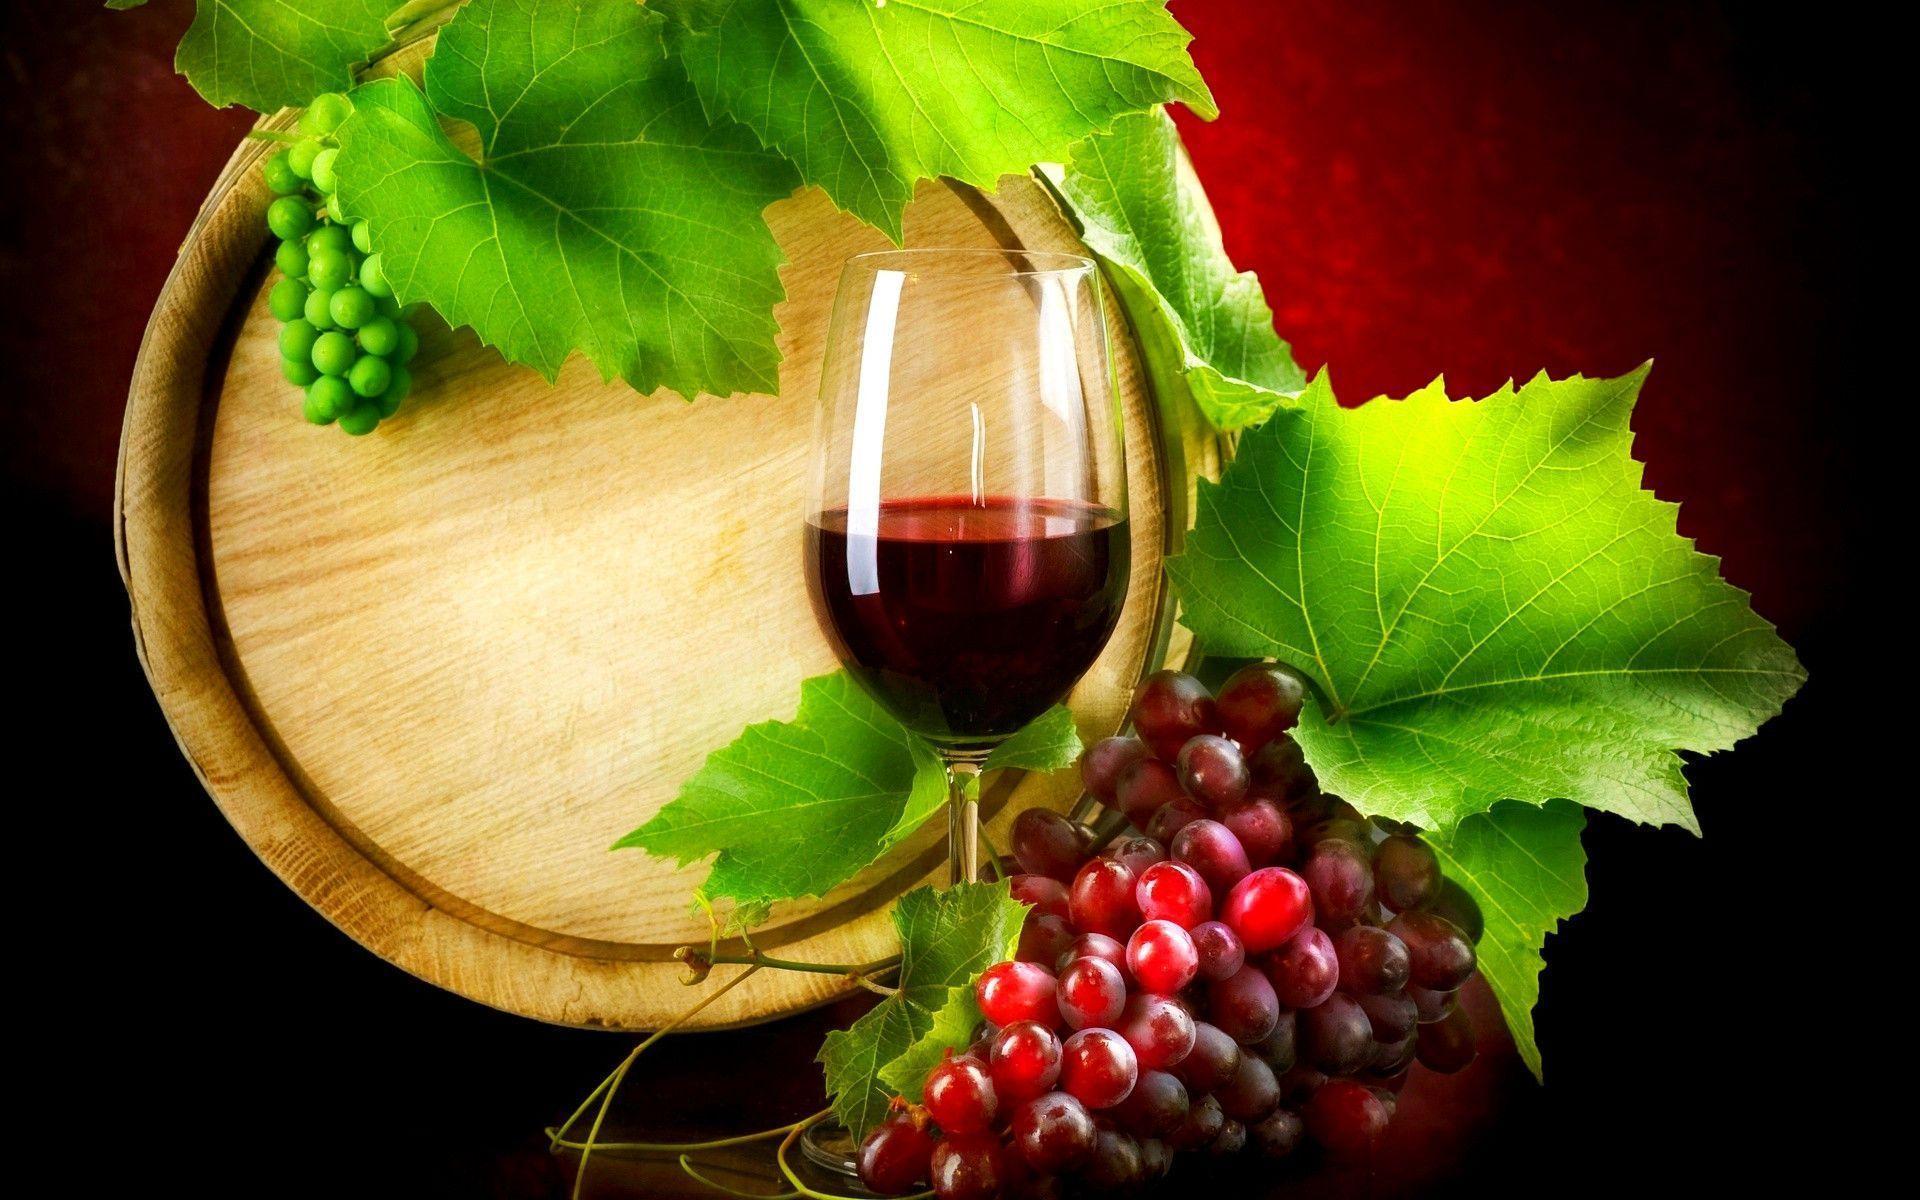 wallpaper wine red bottle - photo #33